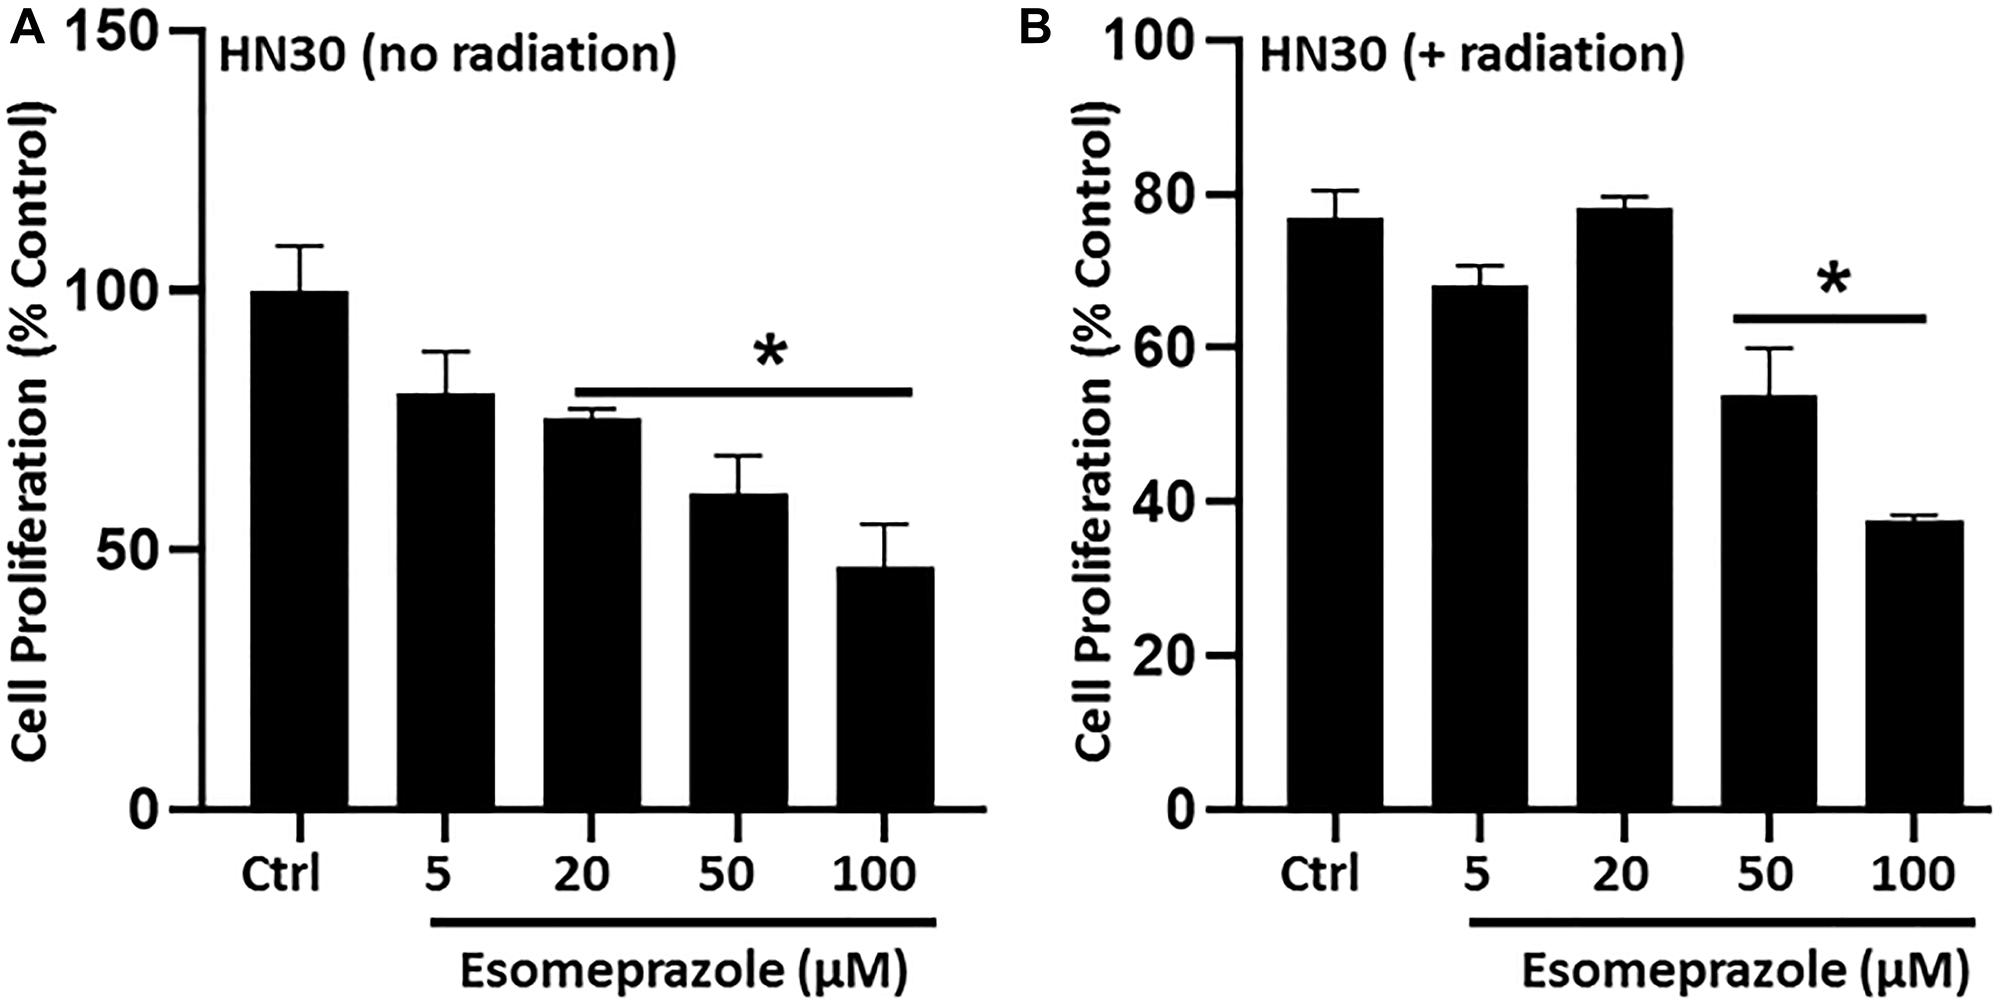 Esomeprazole inhibits cancer cell proliferation.